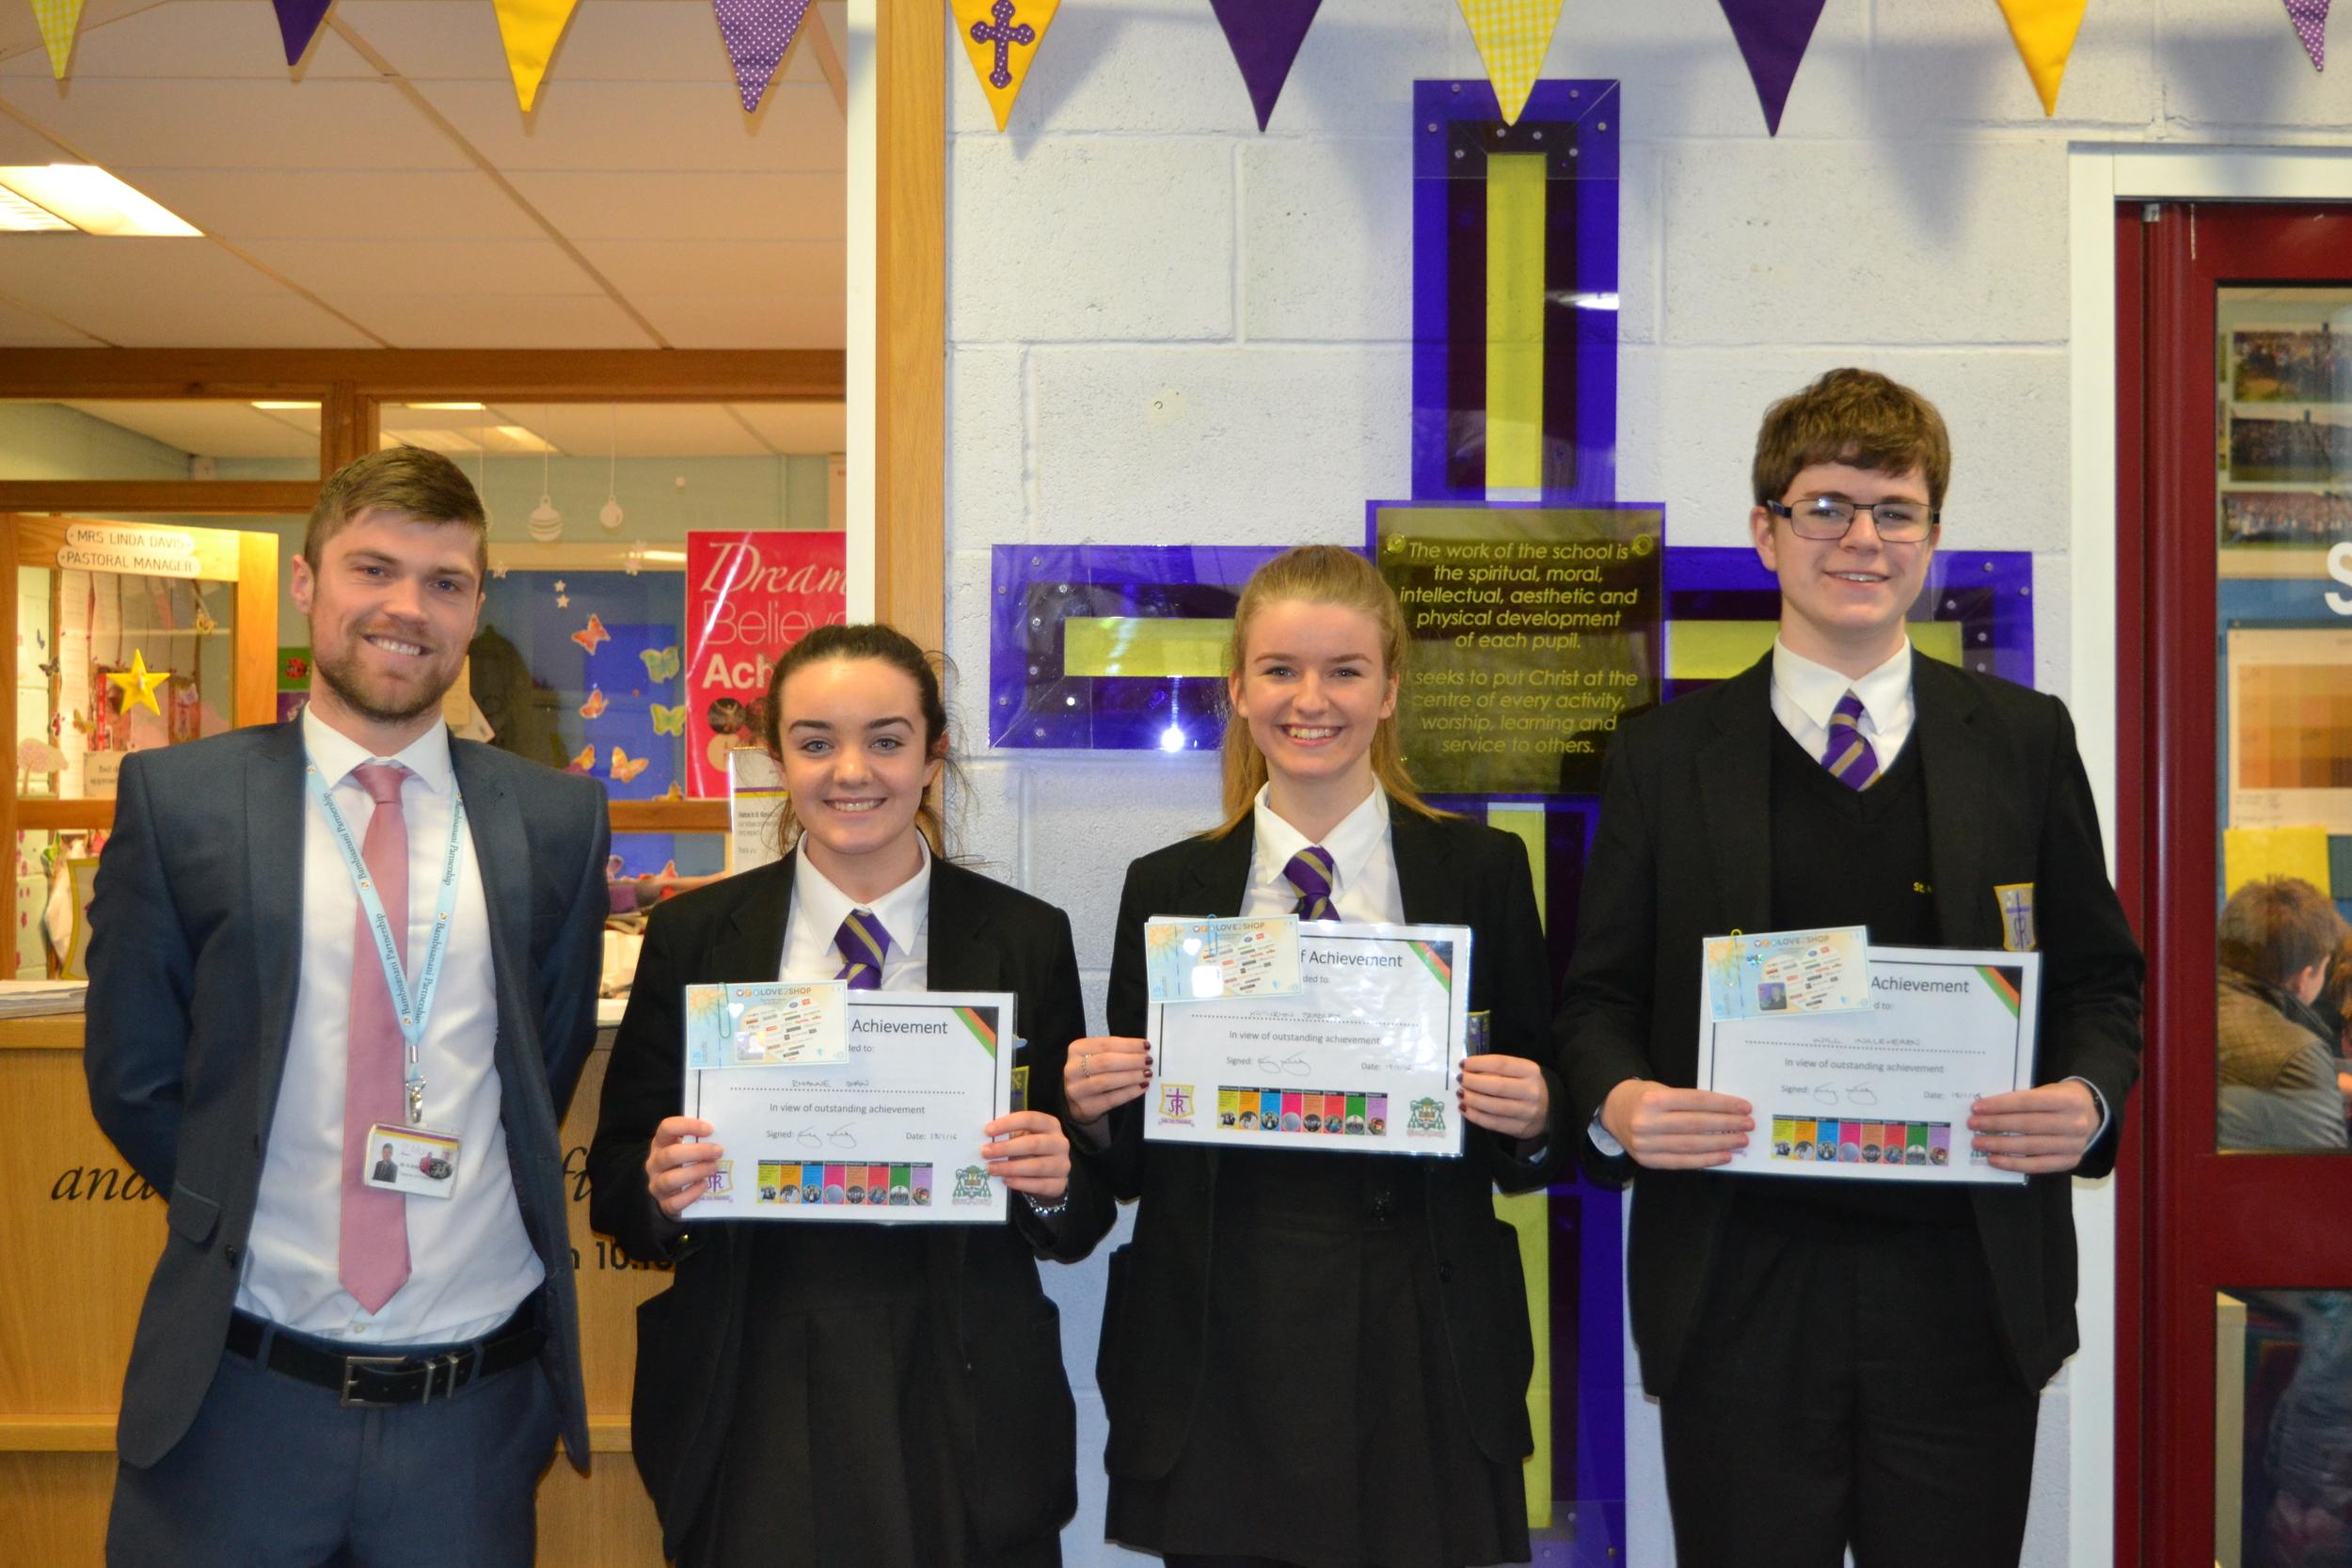 Rhianne Shaw 10M, William Inglehearn 10M and Kathryn Bradley 10W, were presented with Achievement Awards